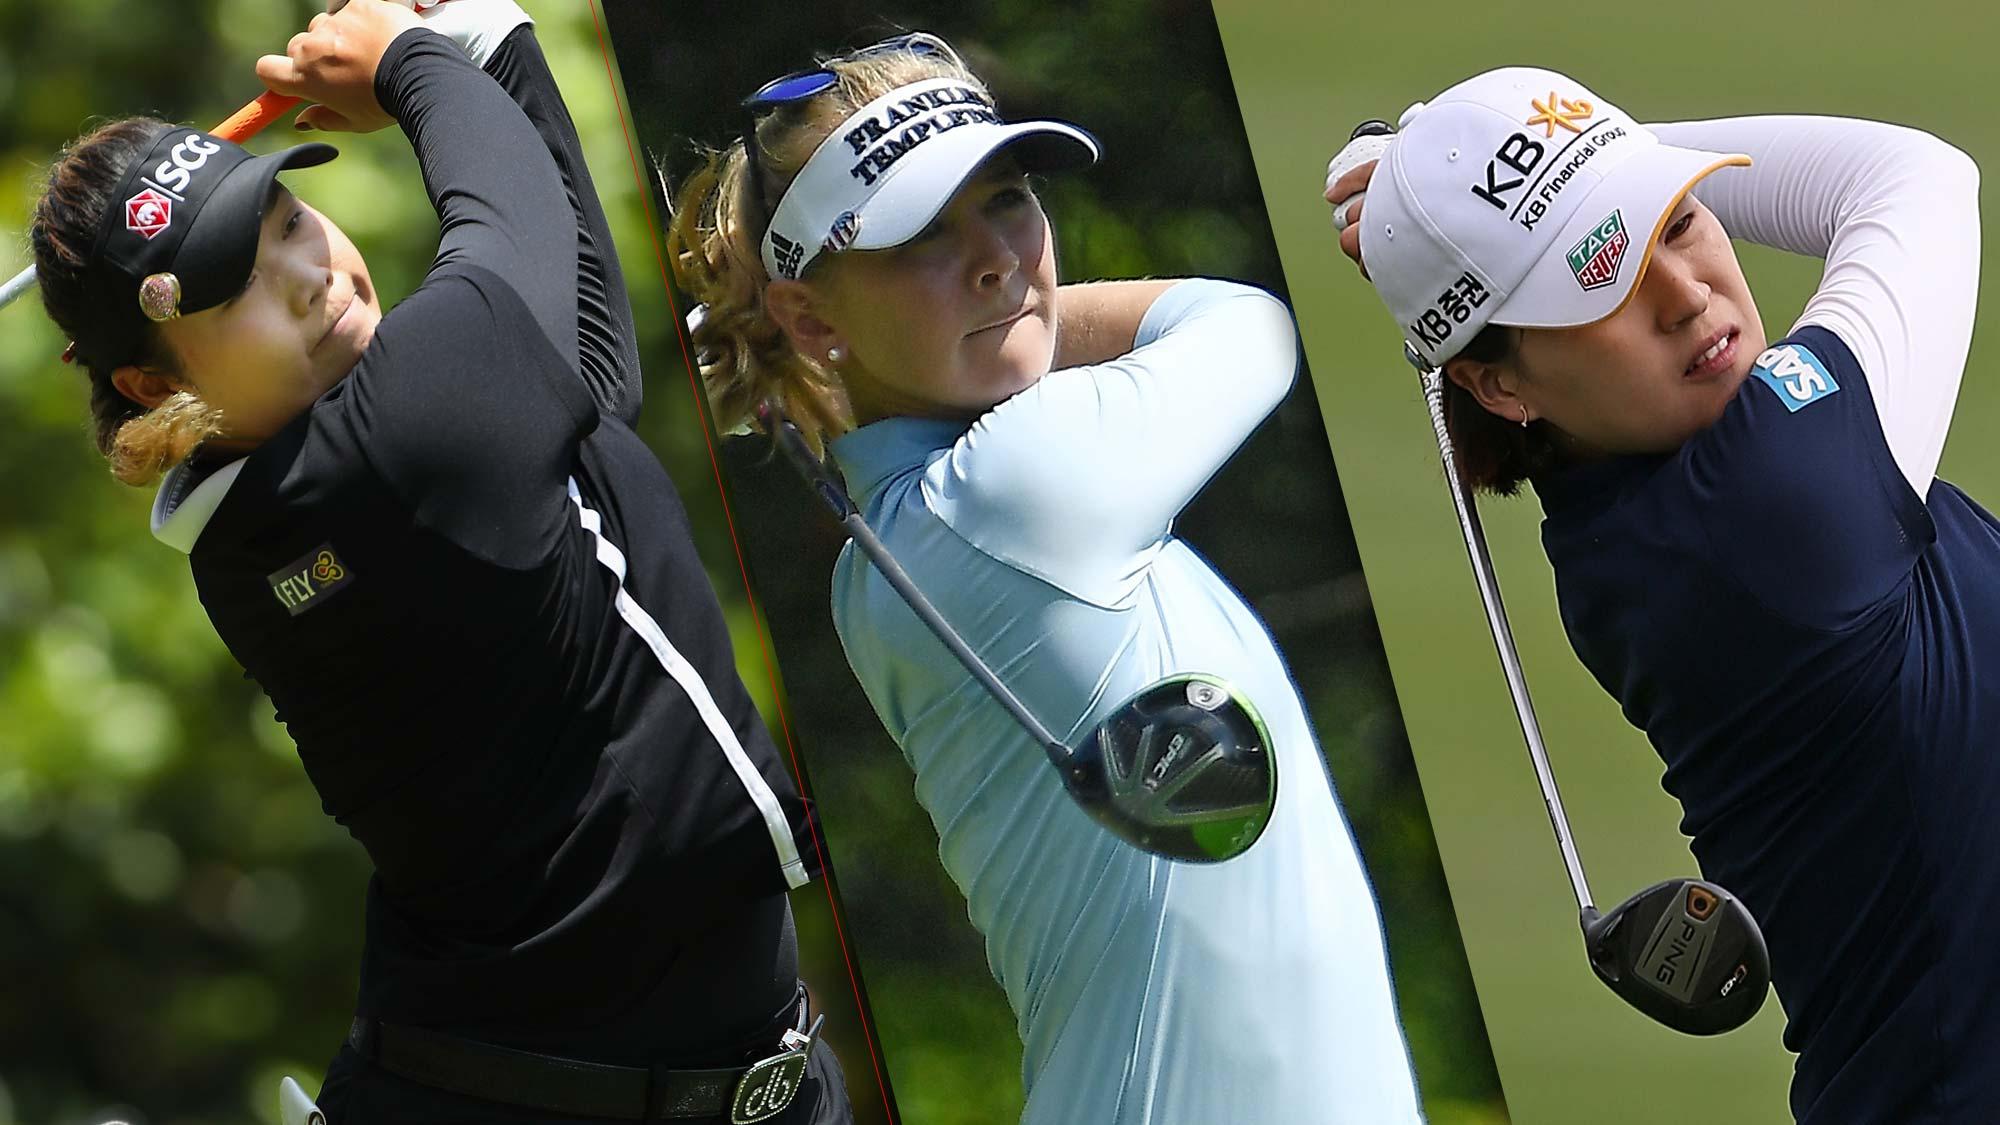 Watch Main article: List of female golfers video